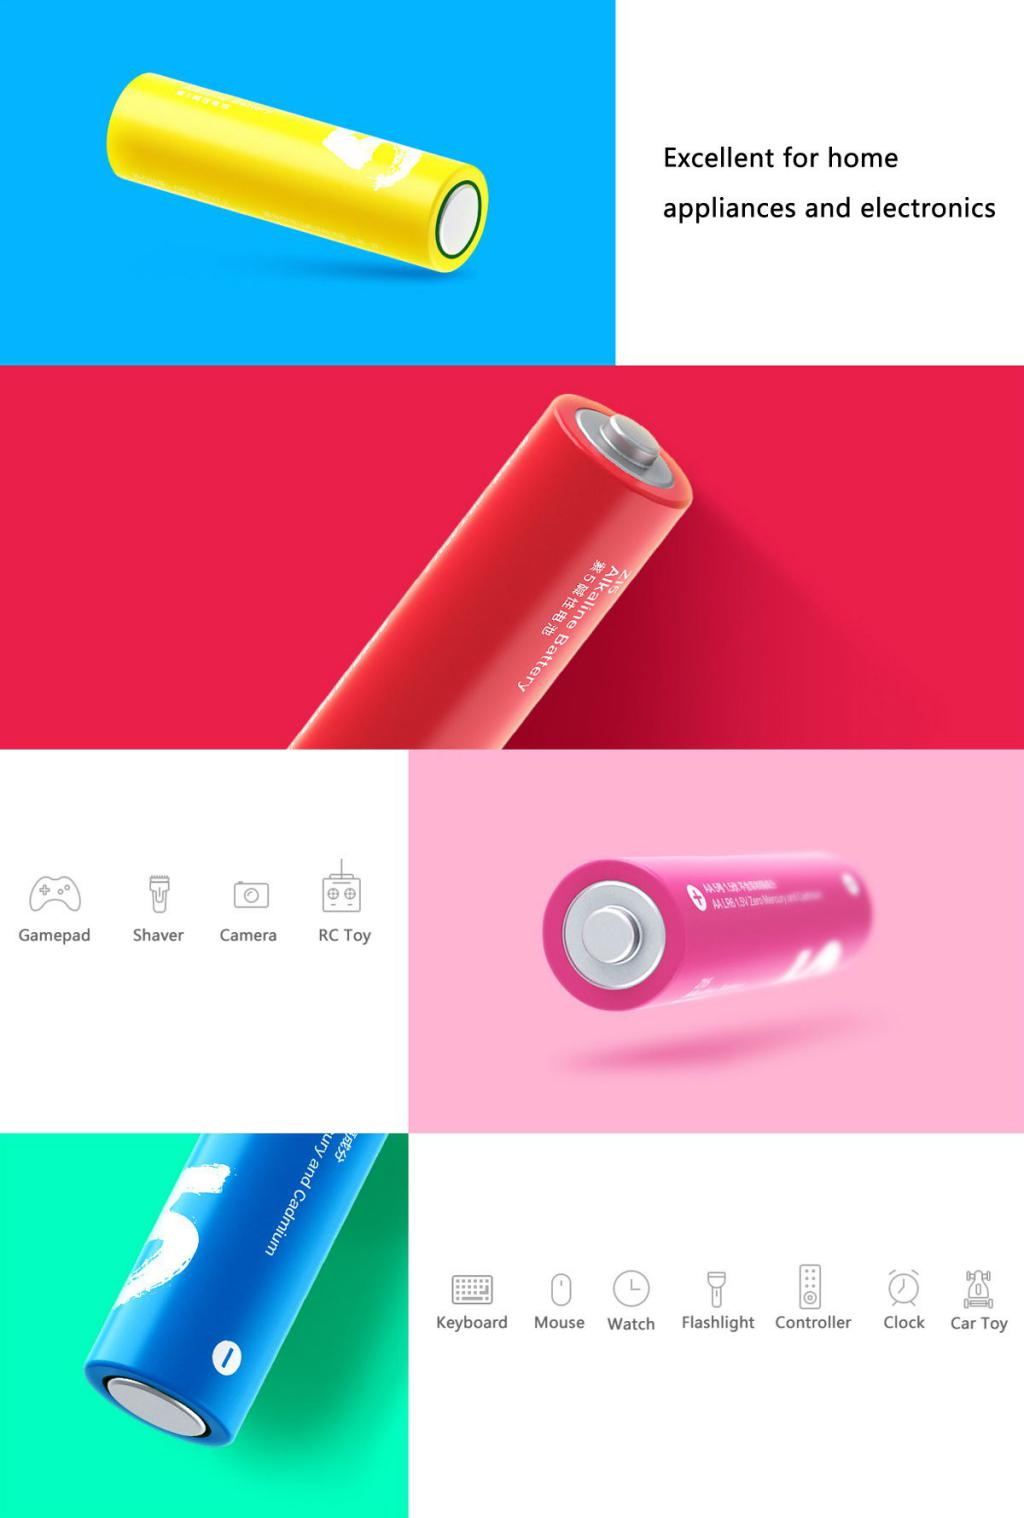 Xiaomi Zi5 Rainbow 1 5v Aa Alkaline Battery Set 10pcs (4)